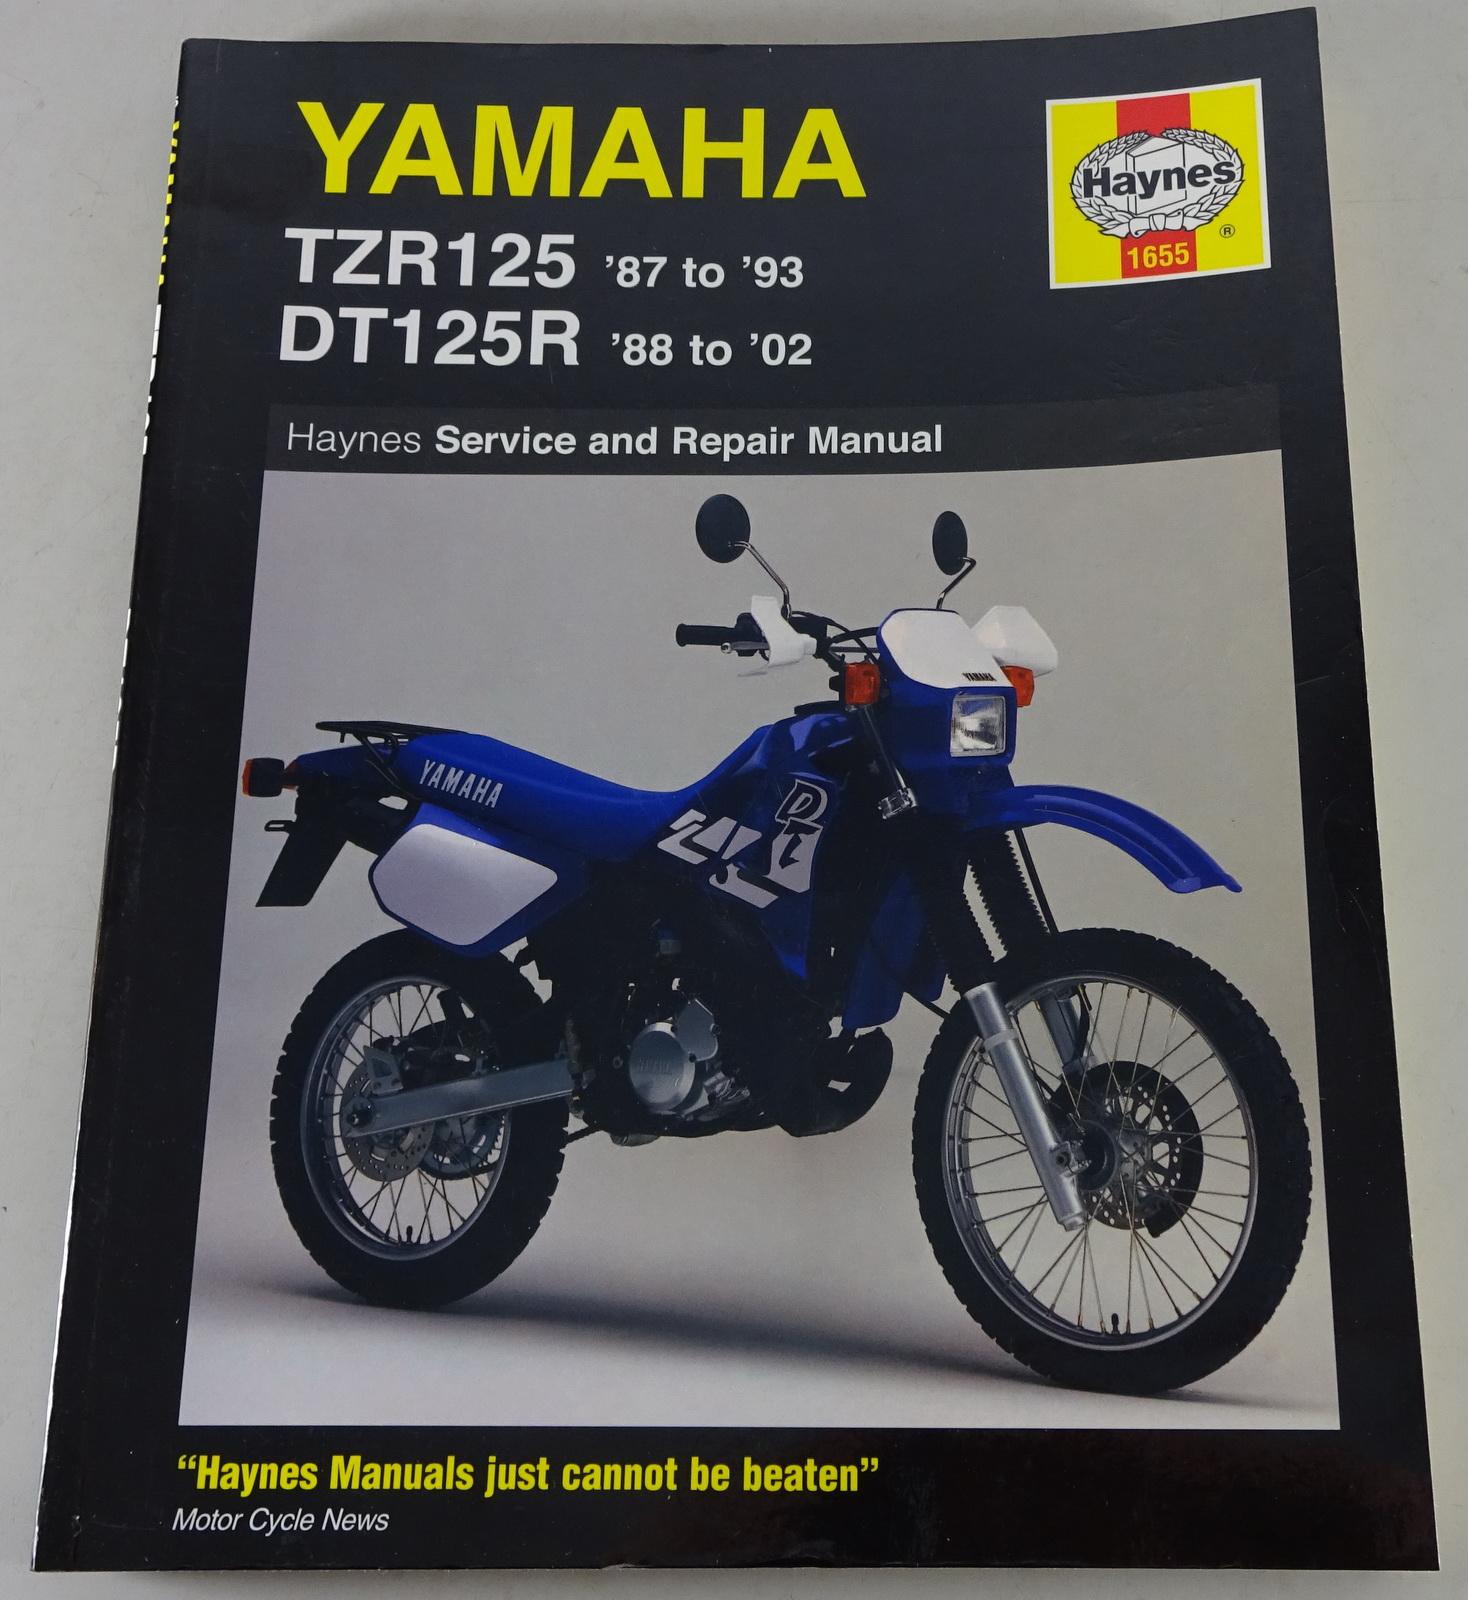 Repair Manual Service Manual Yamaha Tzr 125 Dt 125r 1987 2002 Pk Buch